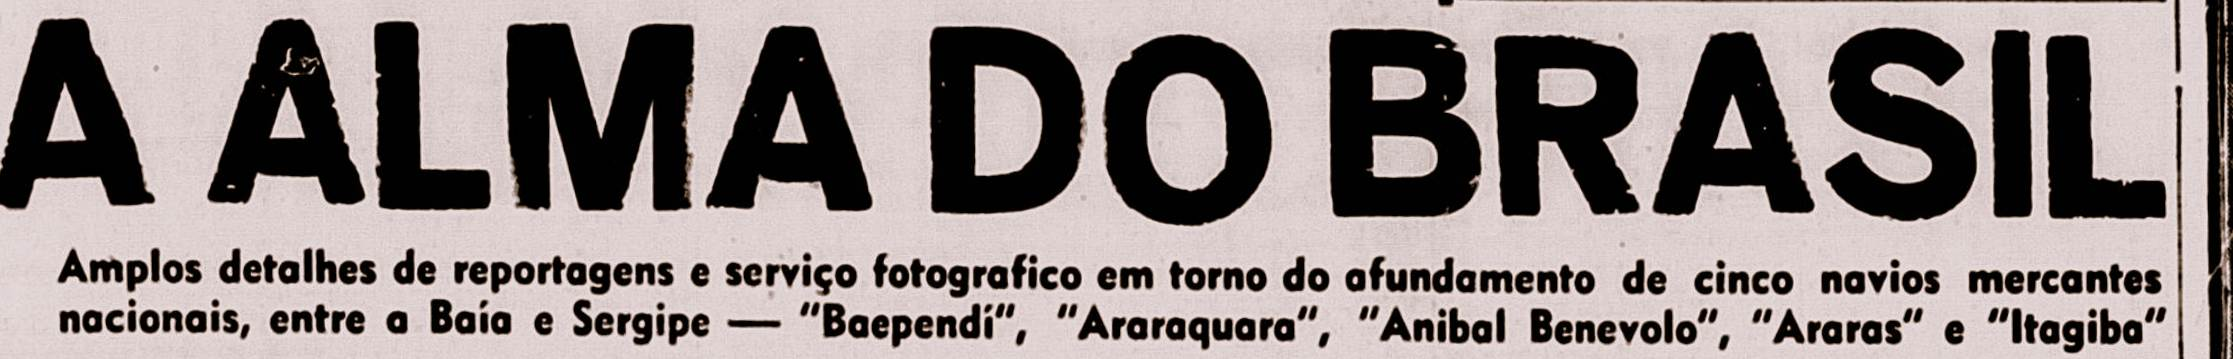 War Brazil (34)